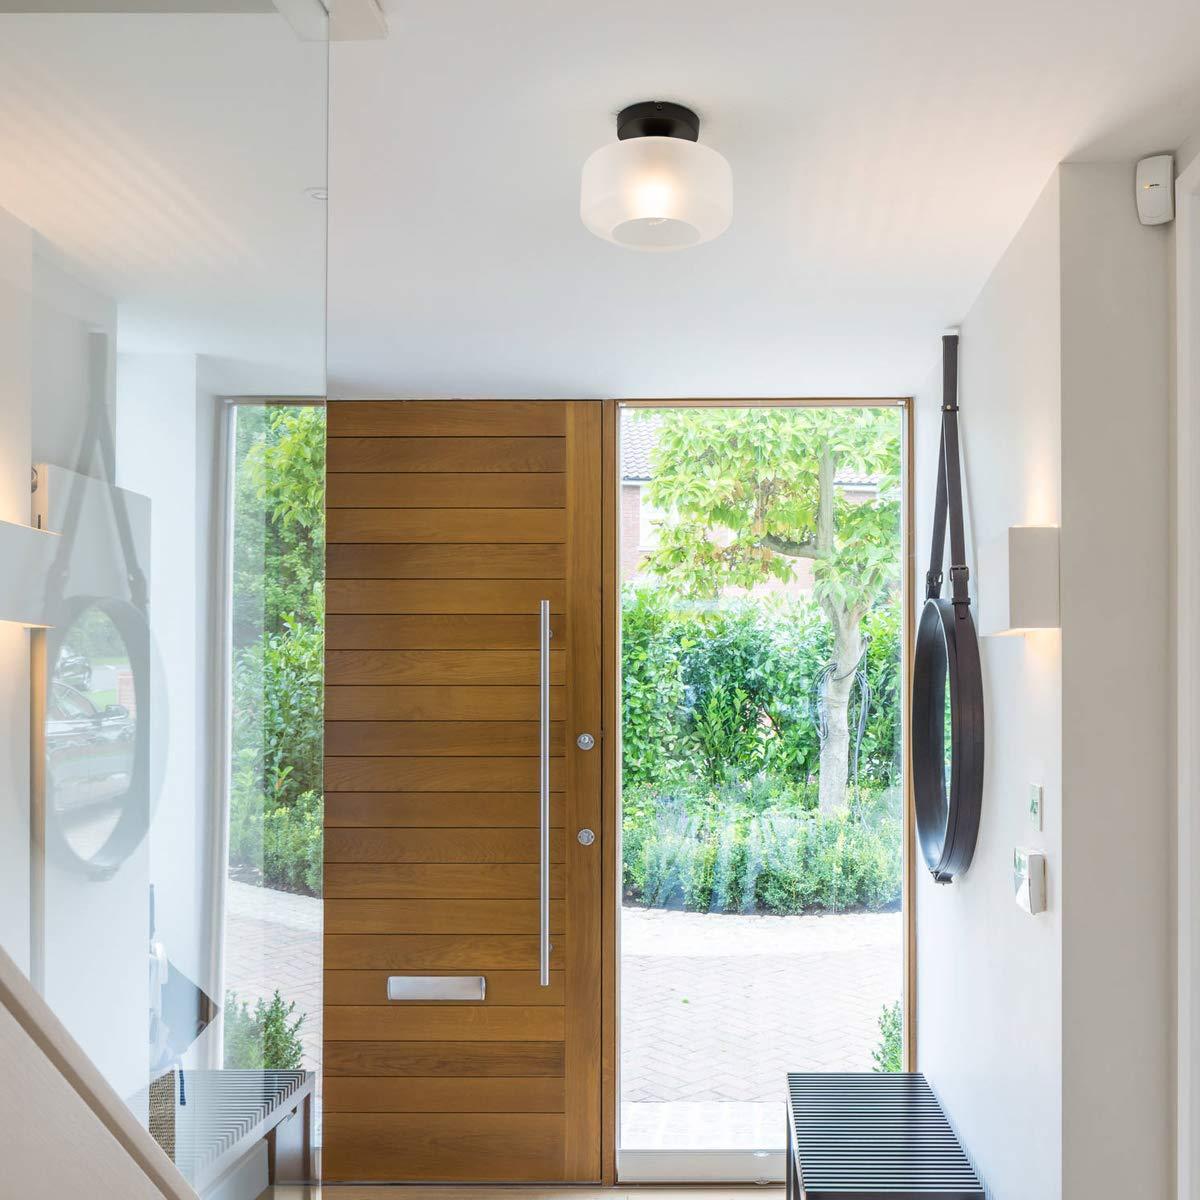 Texture Clear Glass Shade Semi Flush Mount for Hallway,Entryway,Foyer,Bedroom TeHenoo Industrial Flush Mount Ceiling Light Bar Corridor,Passway Cafe